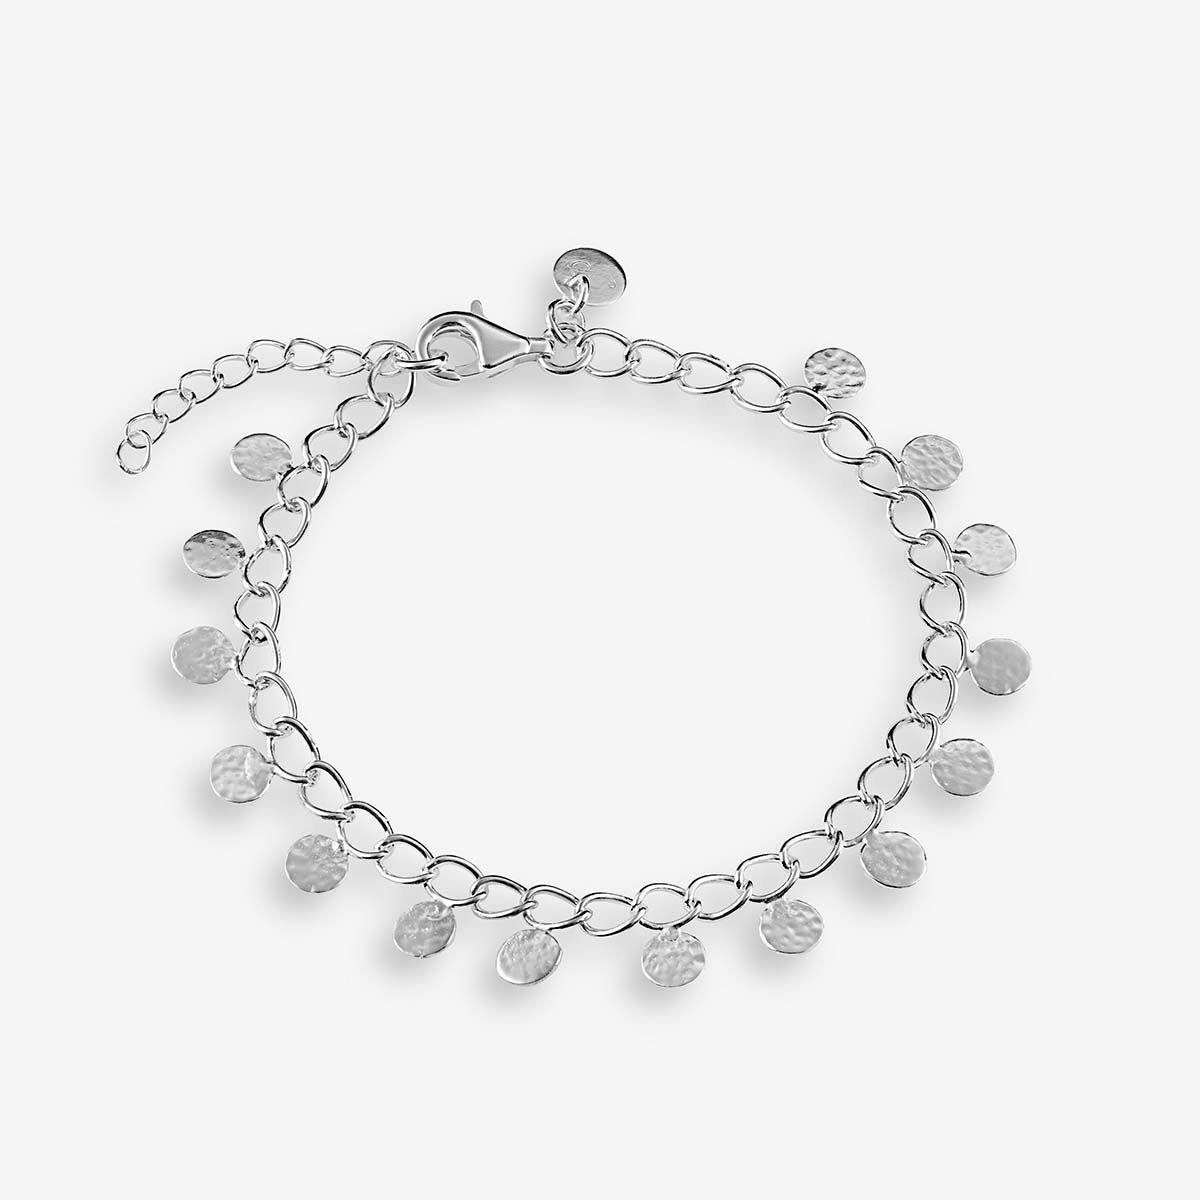 Coin bracelet - Armband - Silber